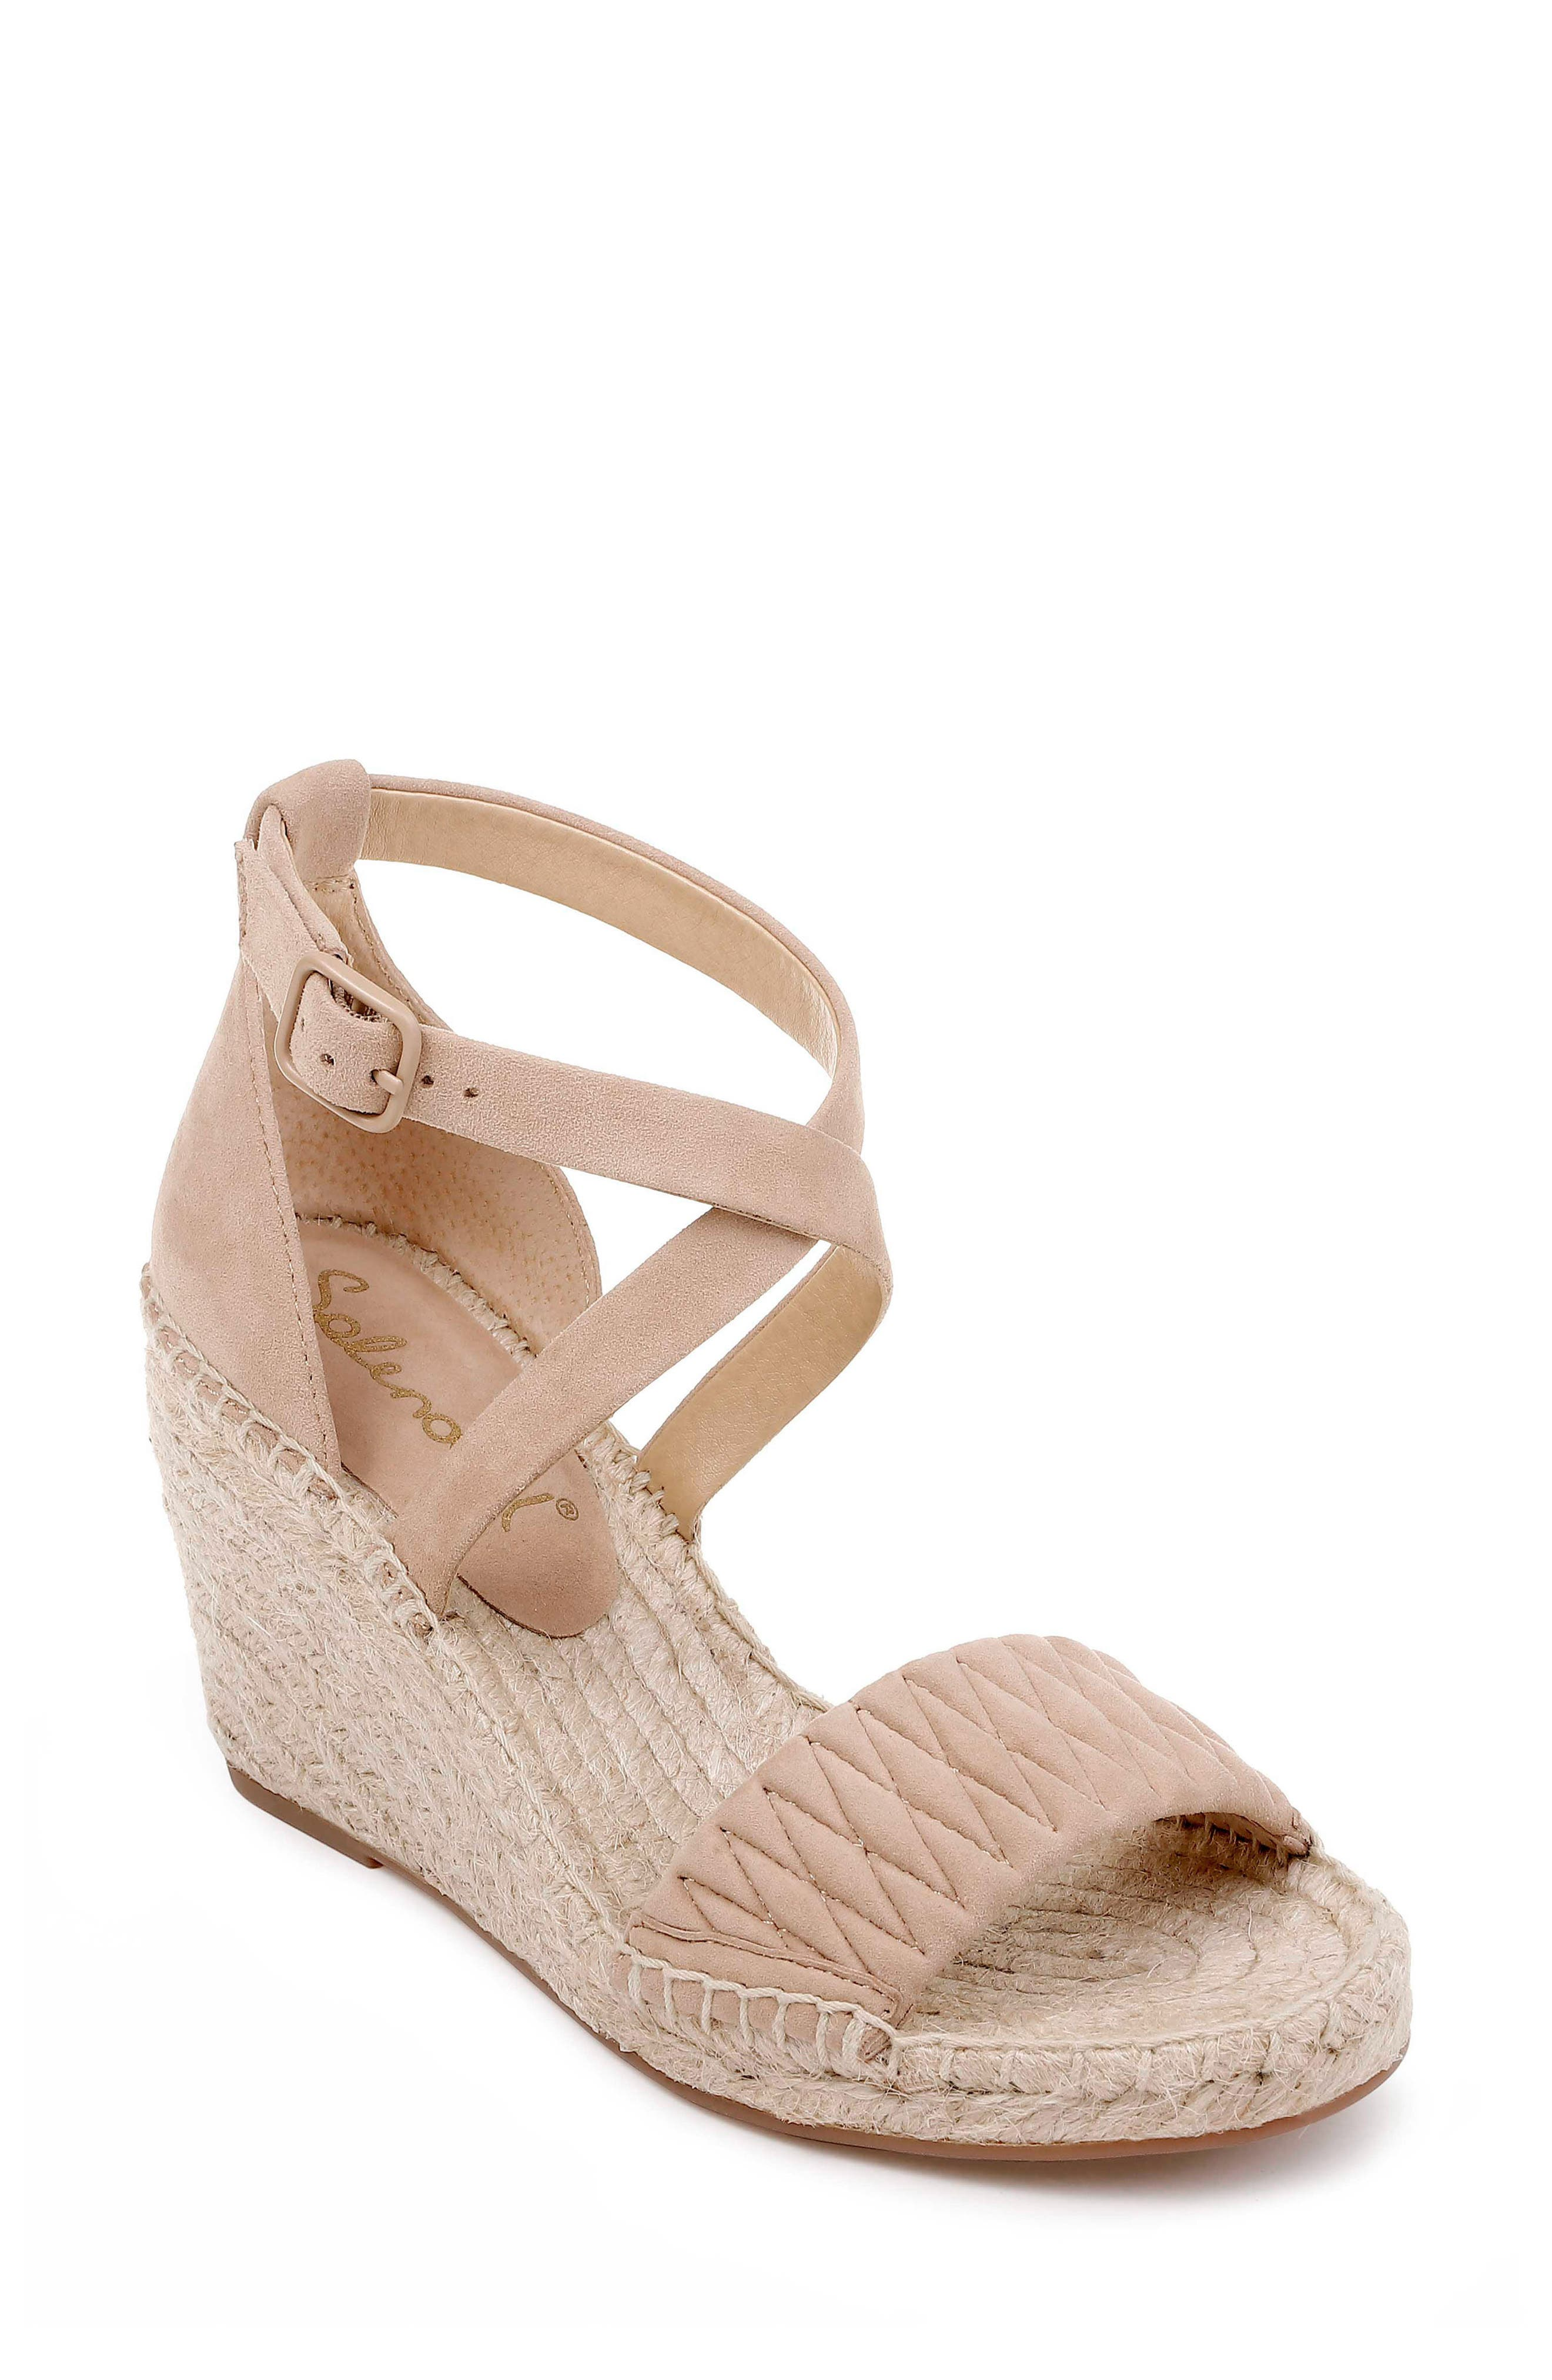 SPLENDID Sheri Wedge Espadrille Sandal, Main, color, DRIFTWOOD SUEDE